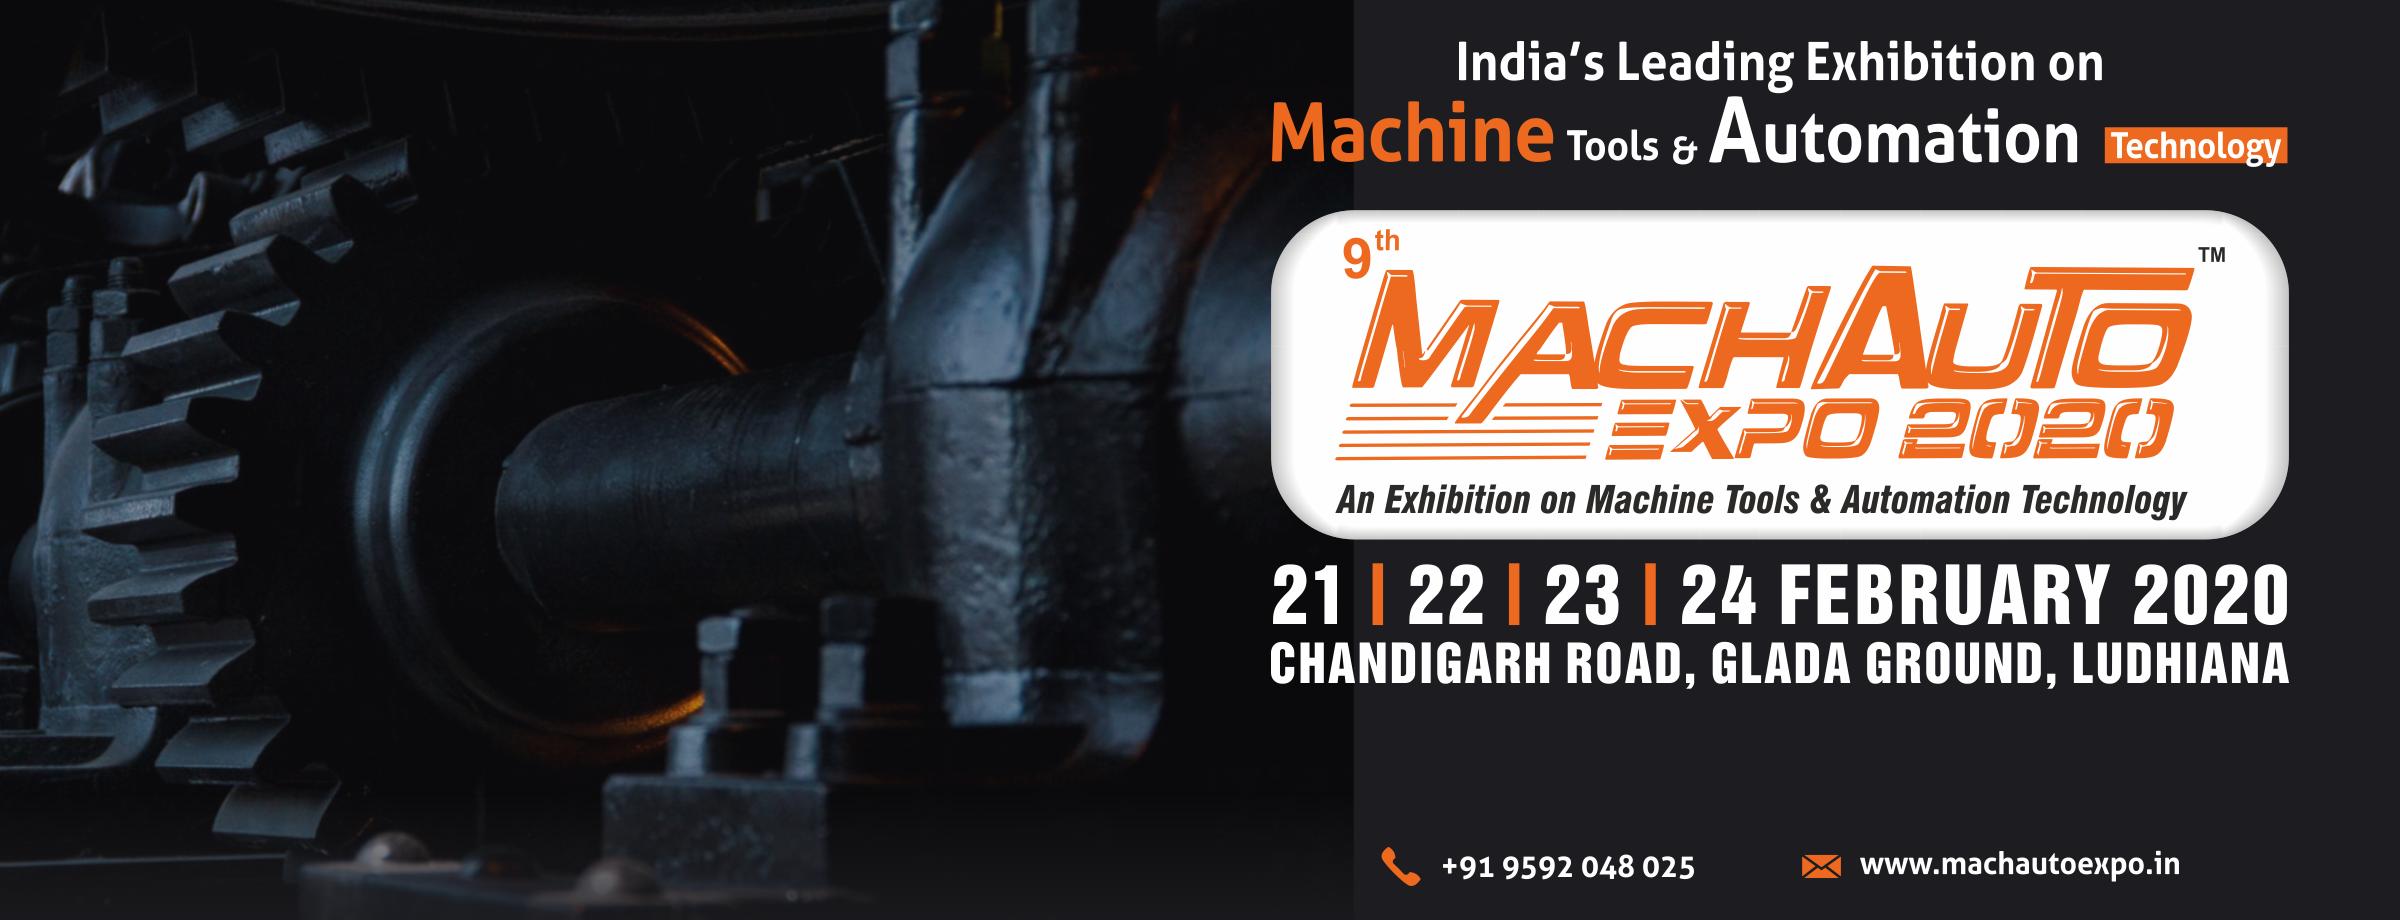 Mach Auto-Expo 2020, Ludhiana, Punjab, India